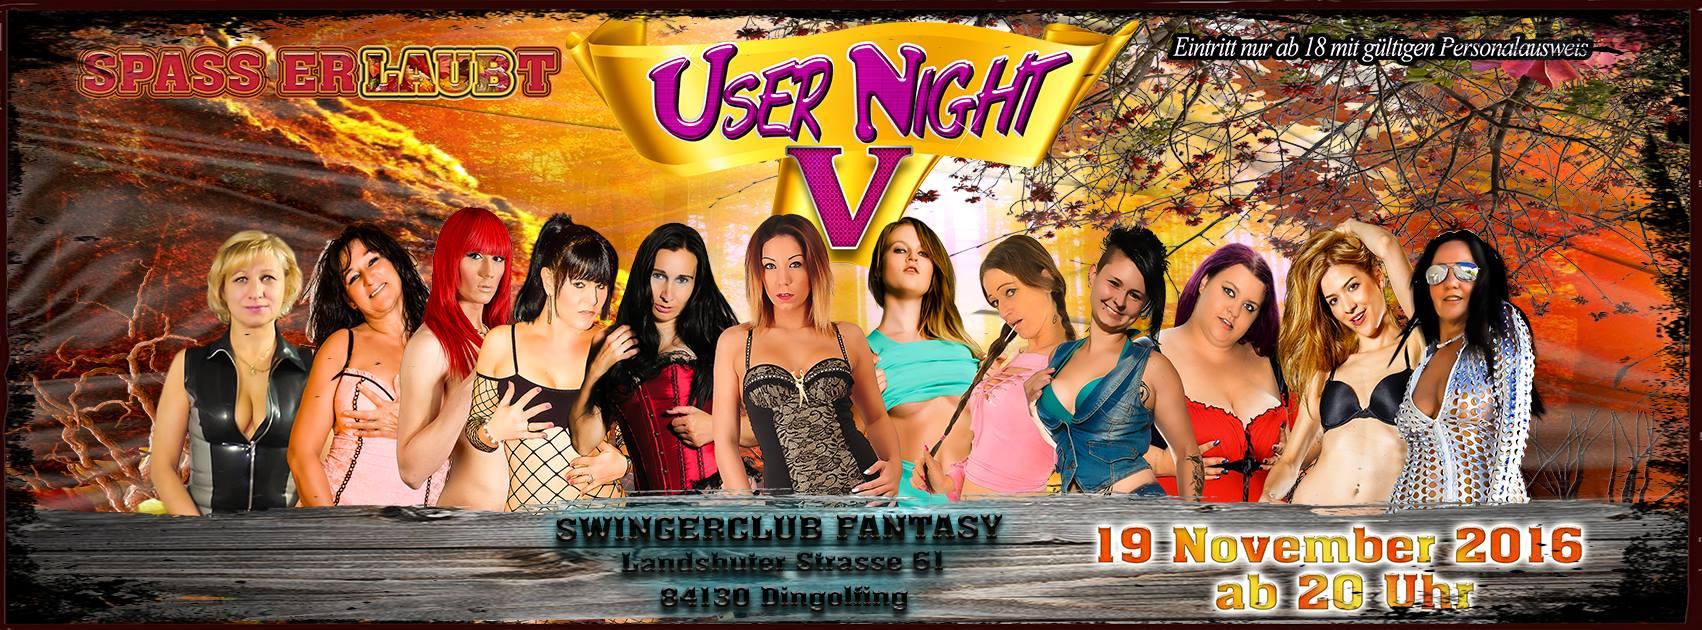 user-night in dingolfing